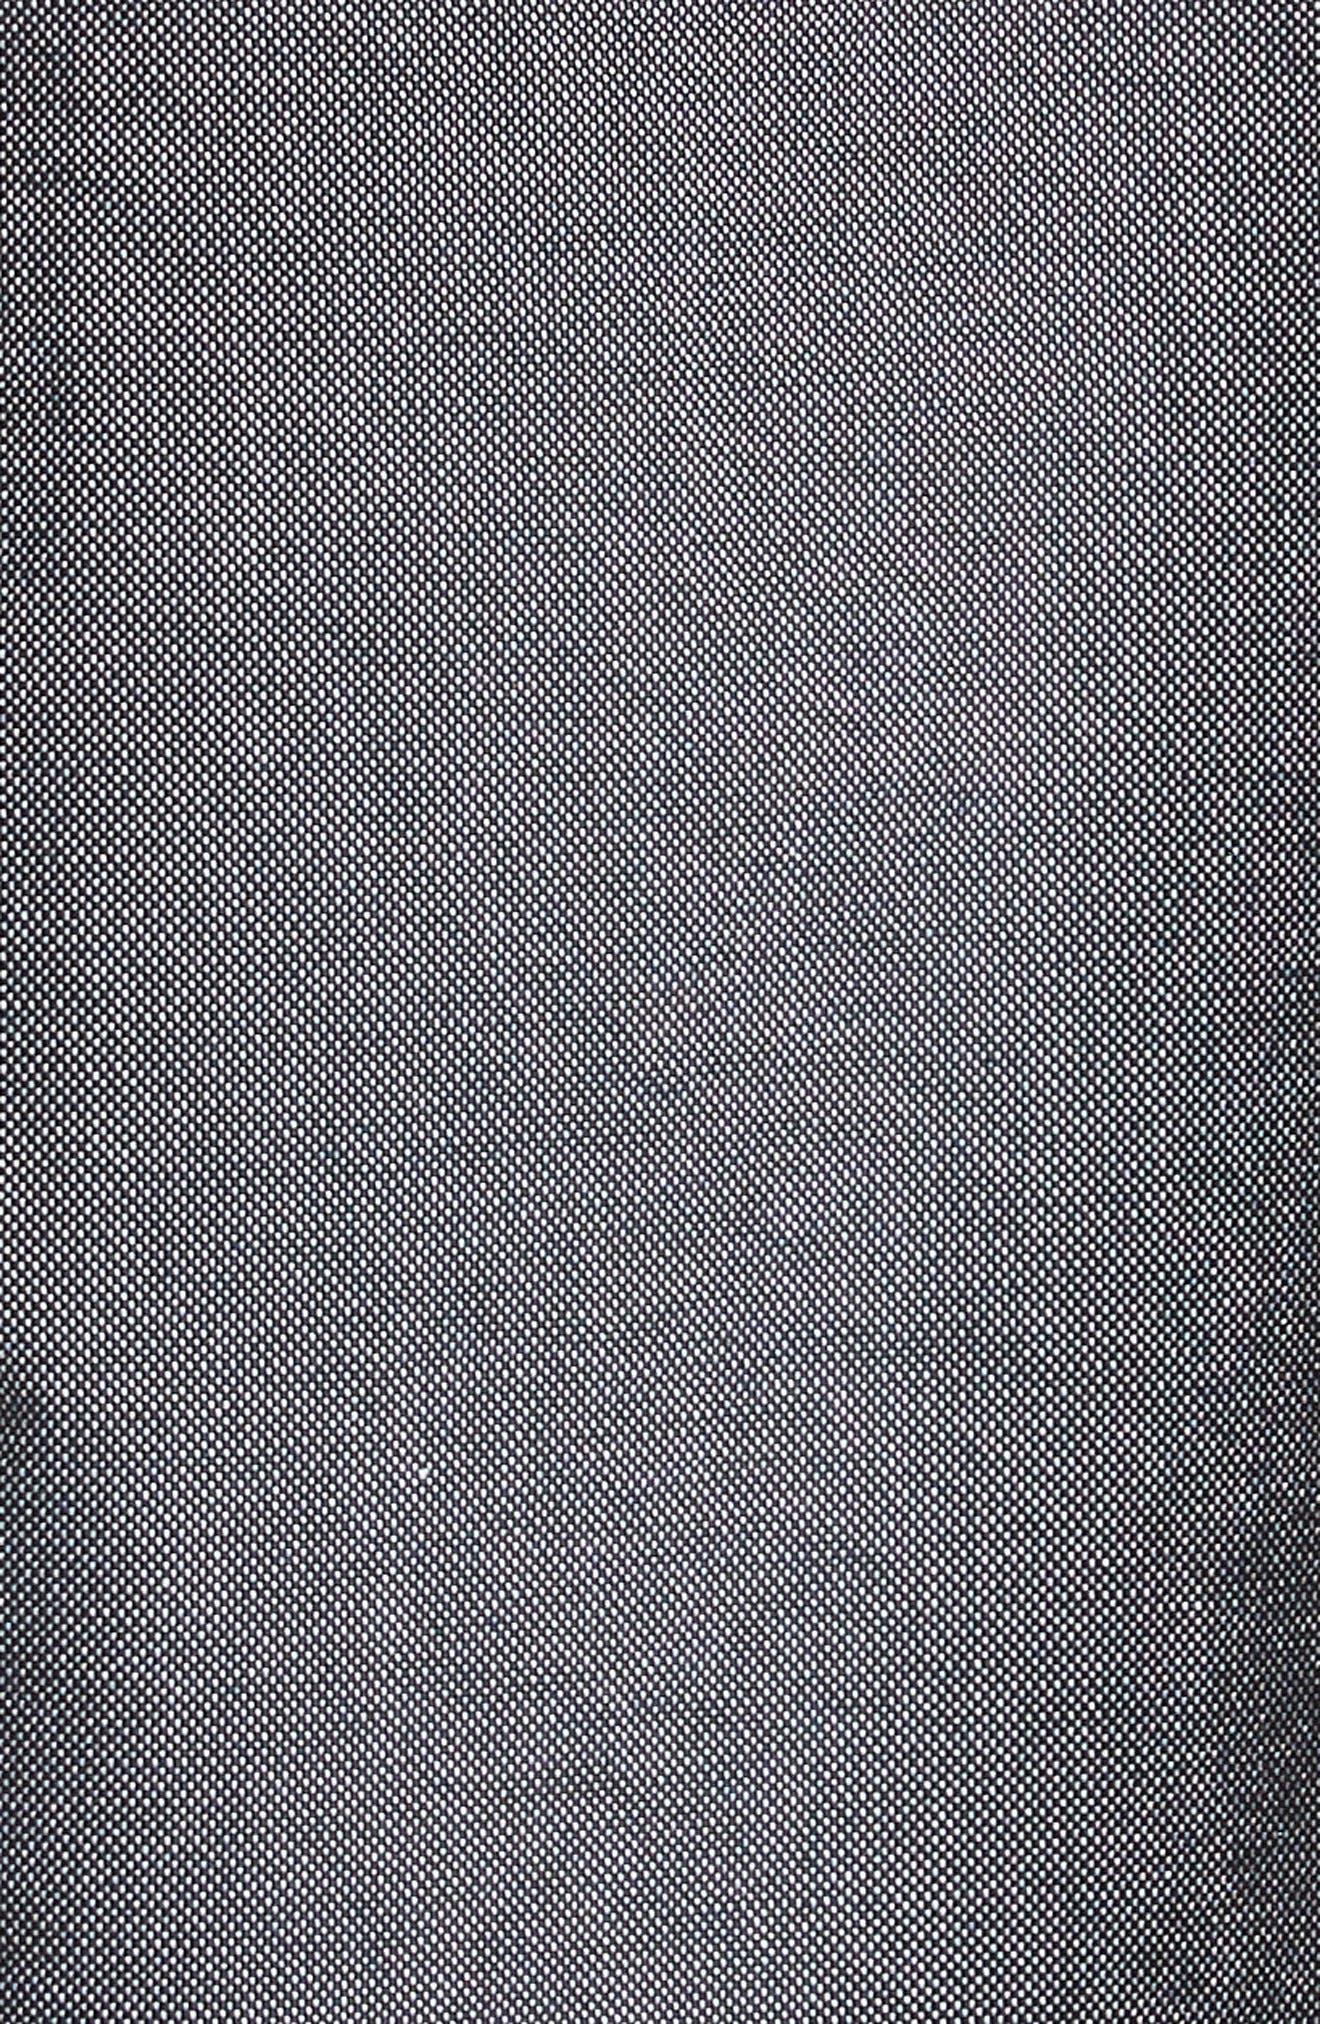 Trim Fit Classic 4-Bar Oxford Shirt,                             Alternate thumbnail 5, color,                             Dark Blue